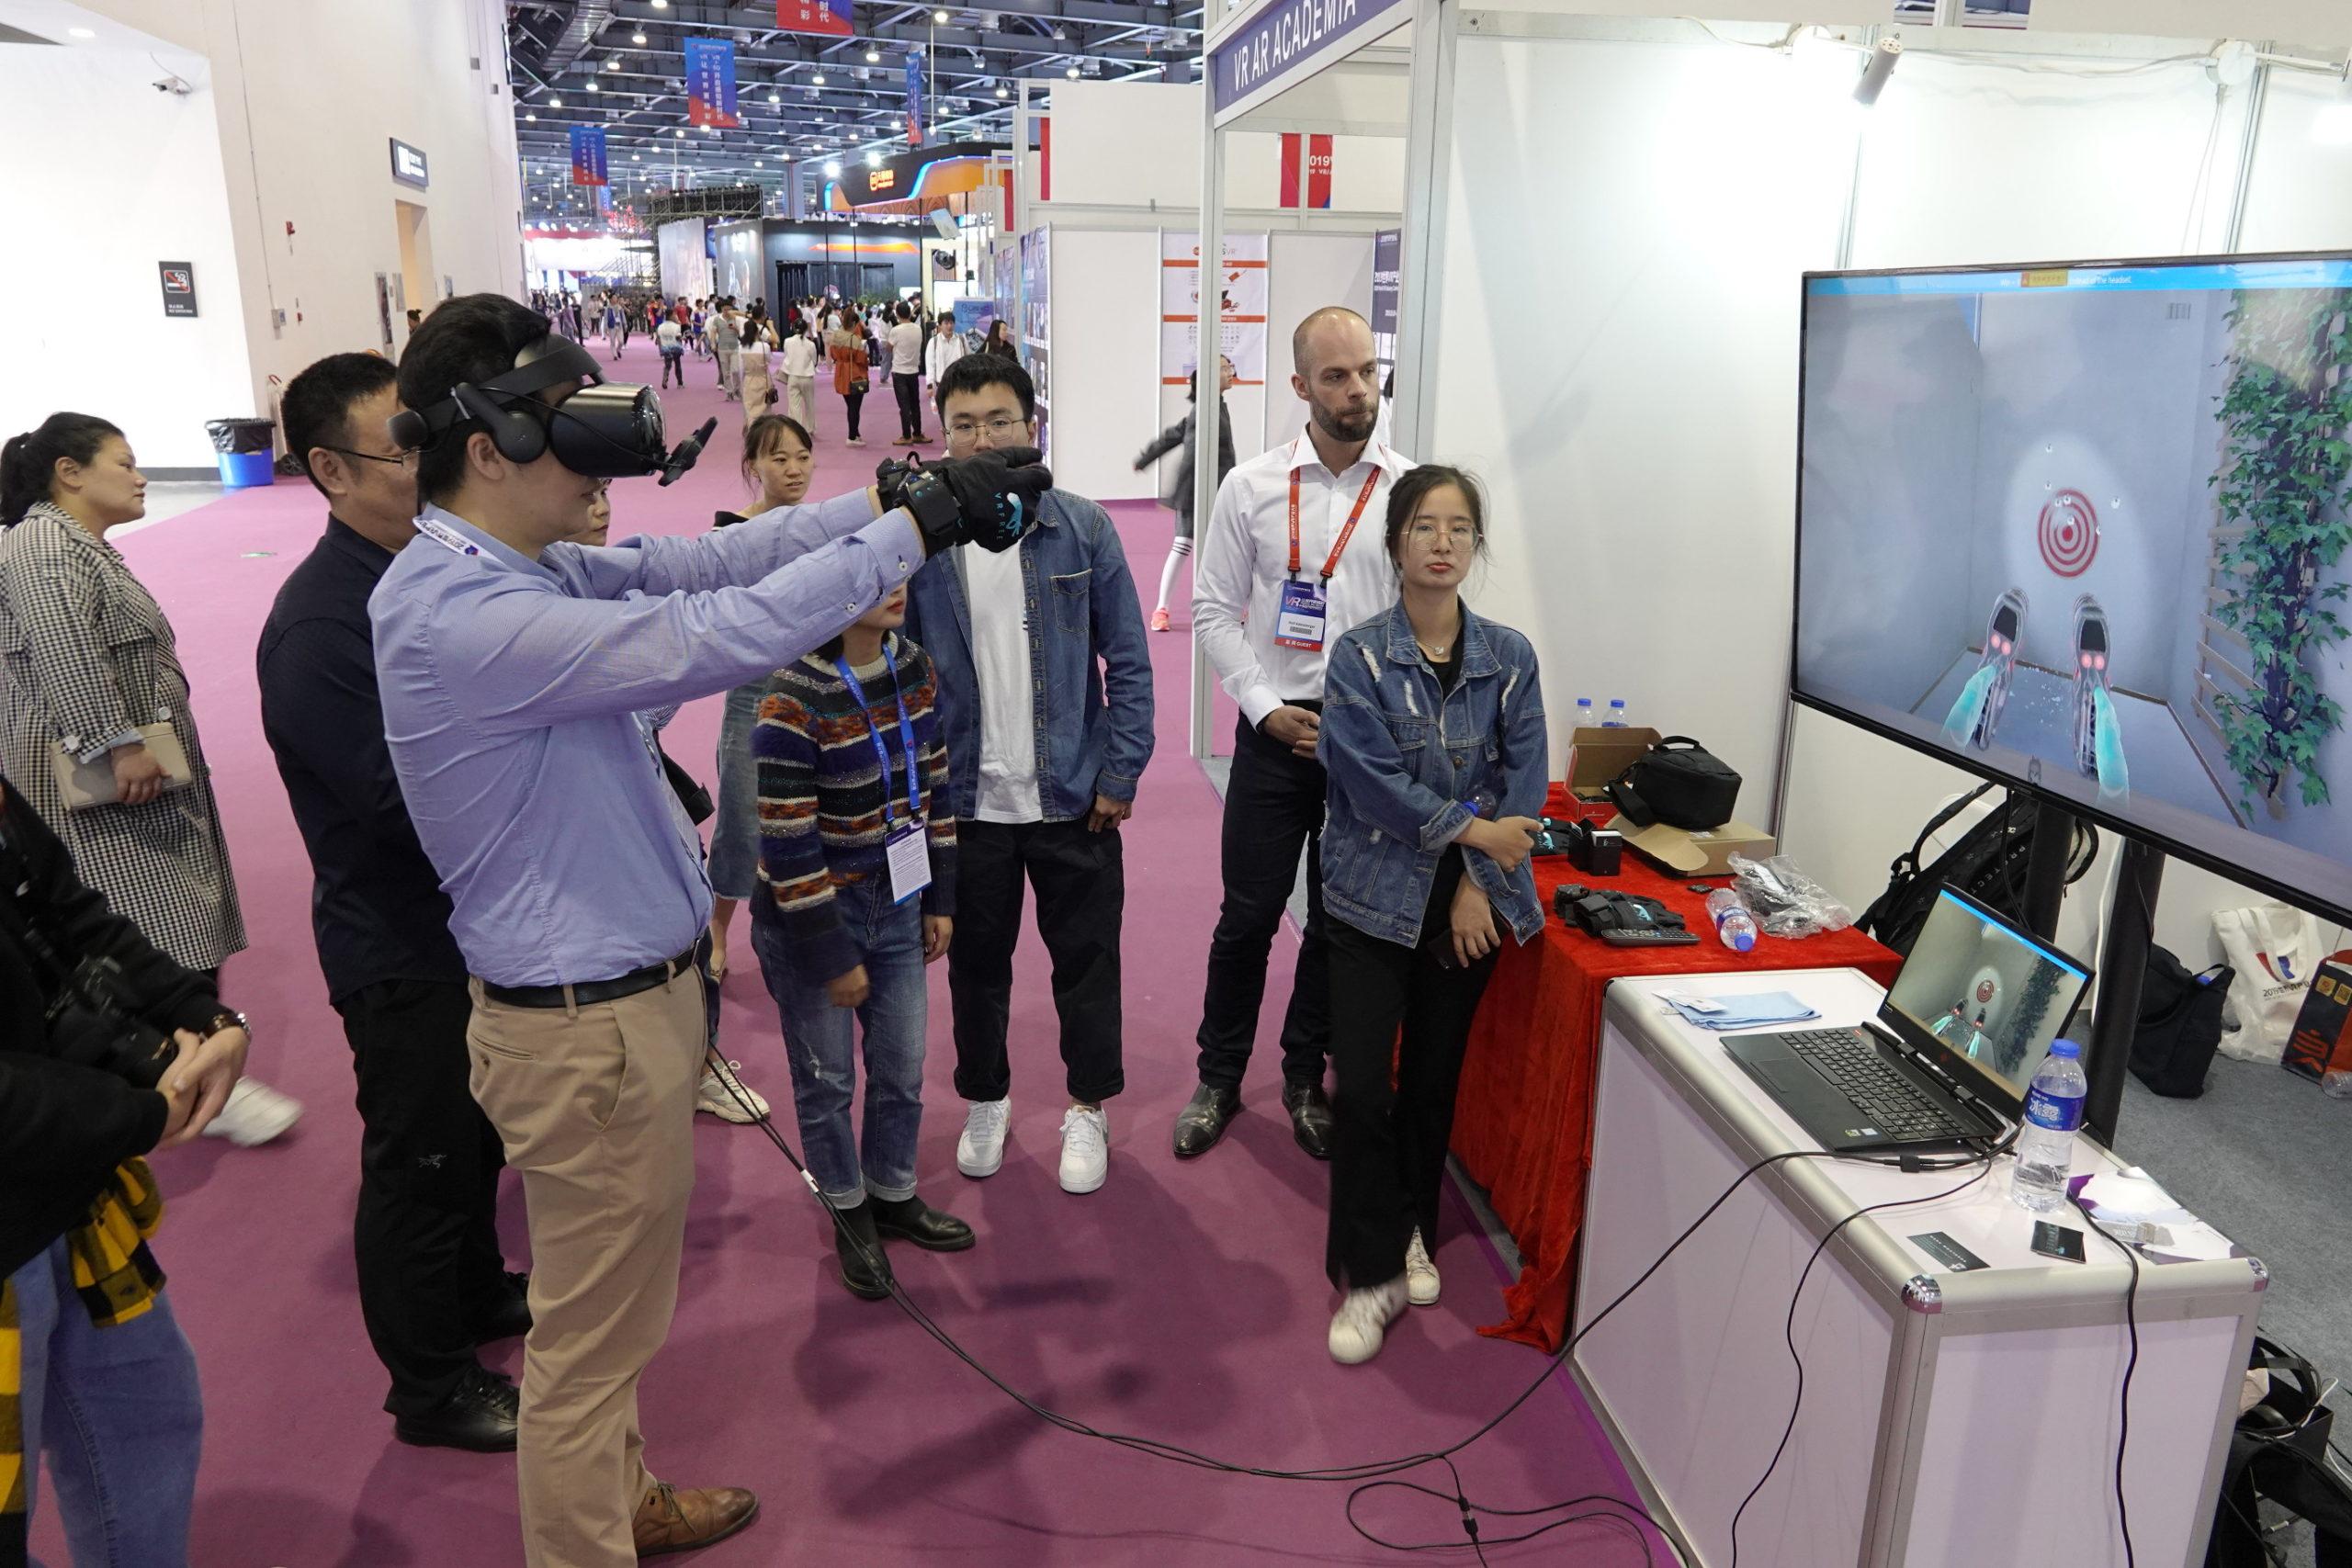 Nanchang lq scaled - Startups rund um den Bodensee